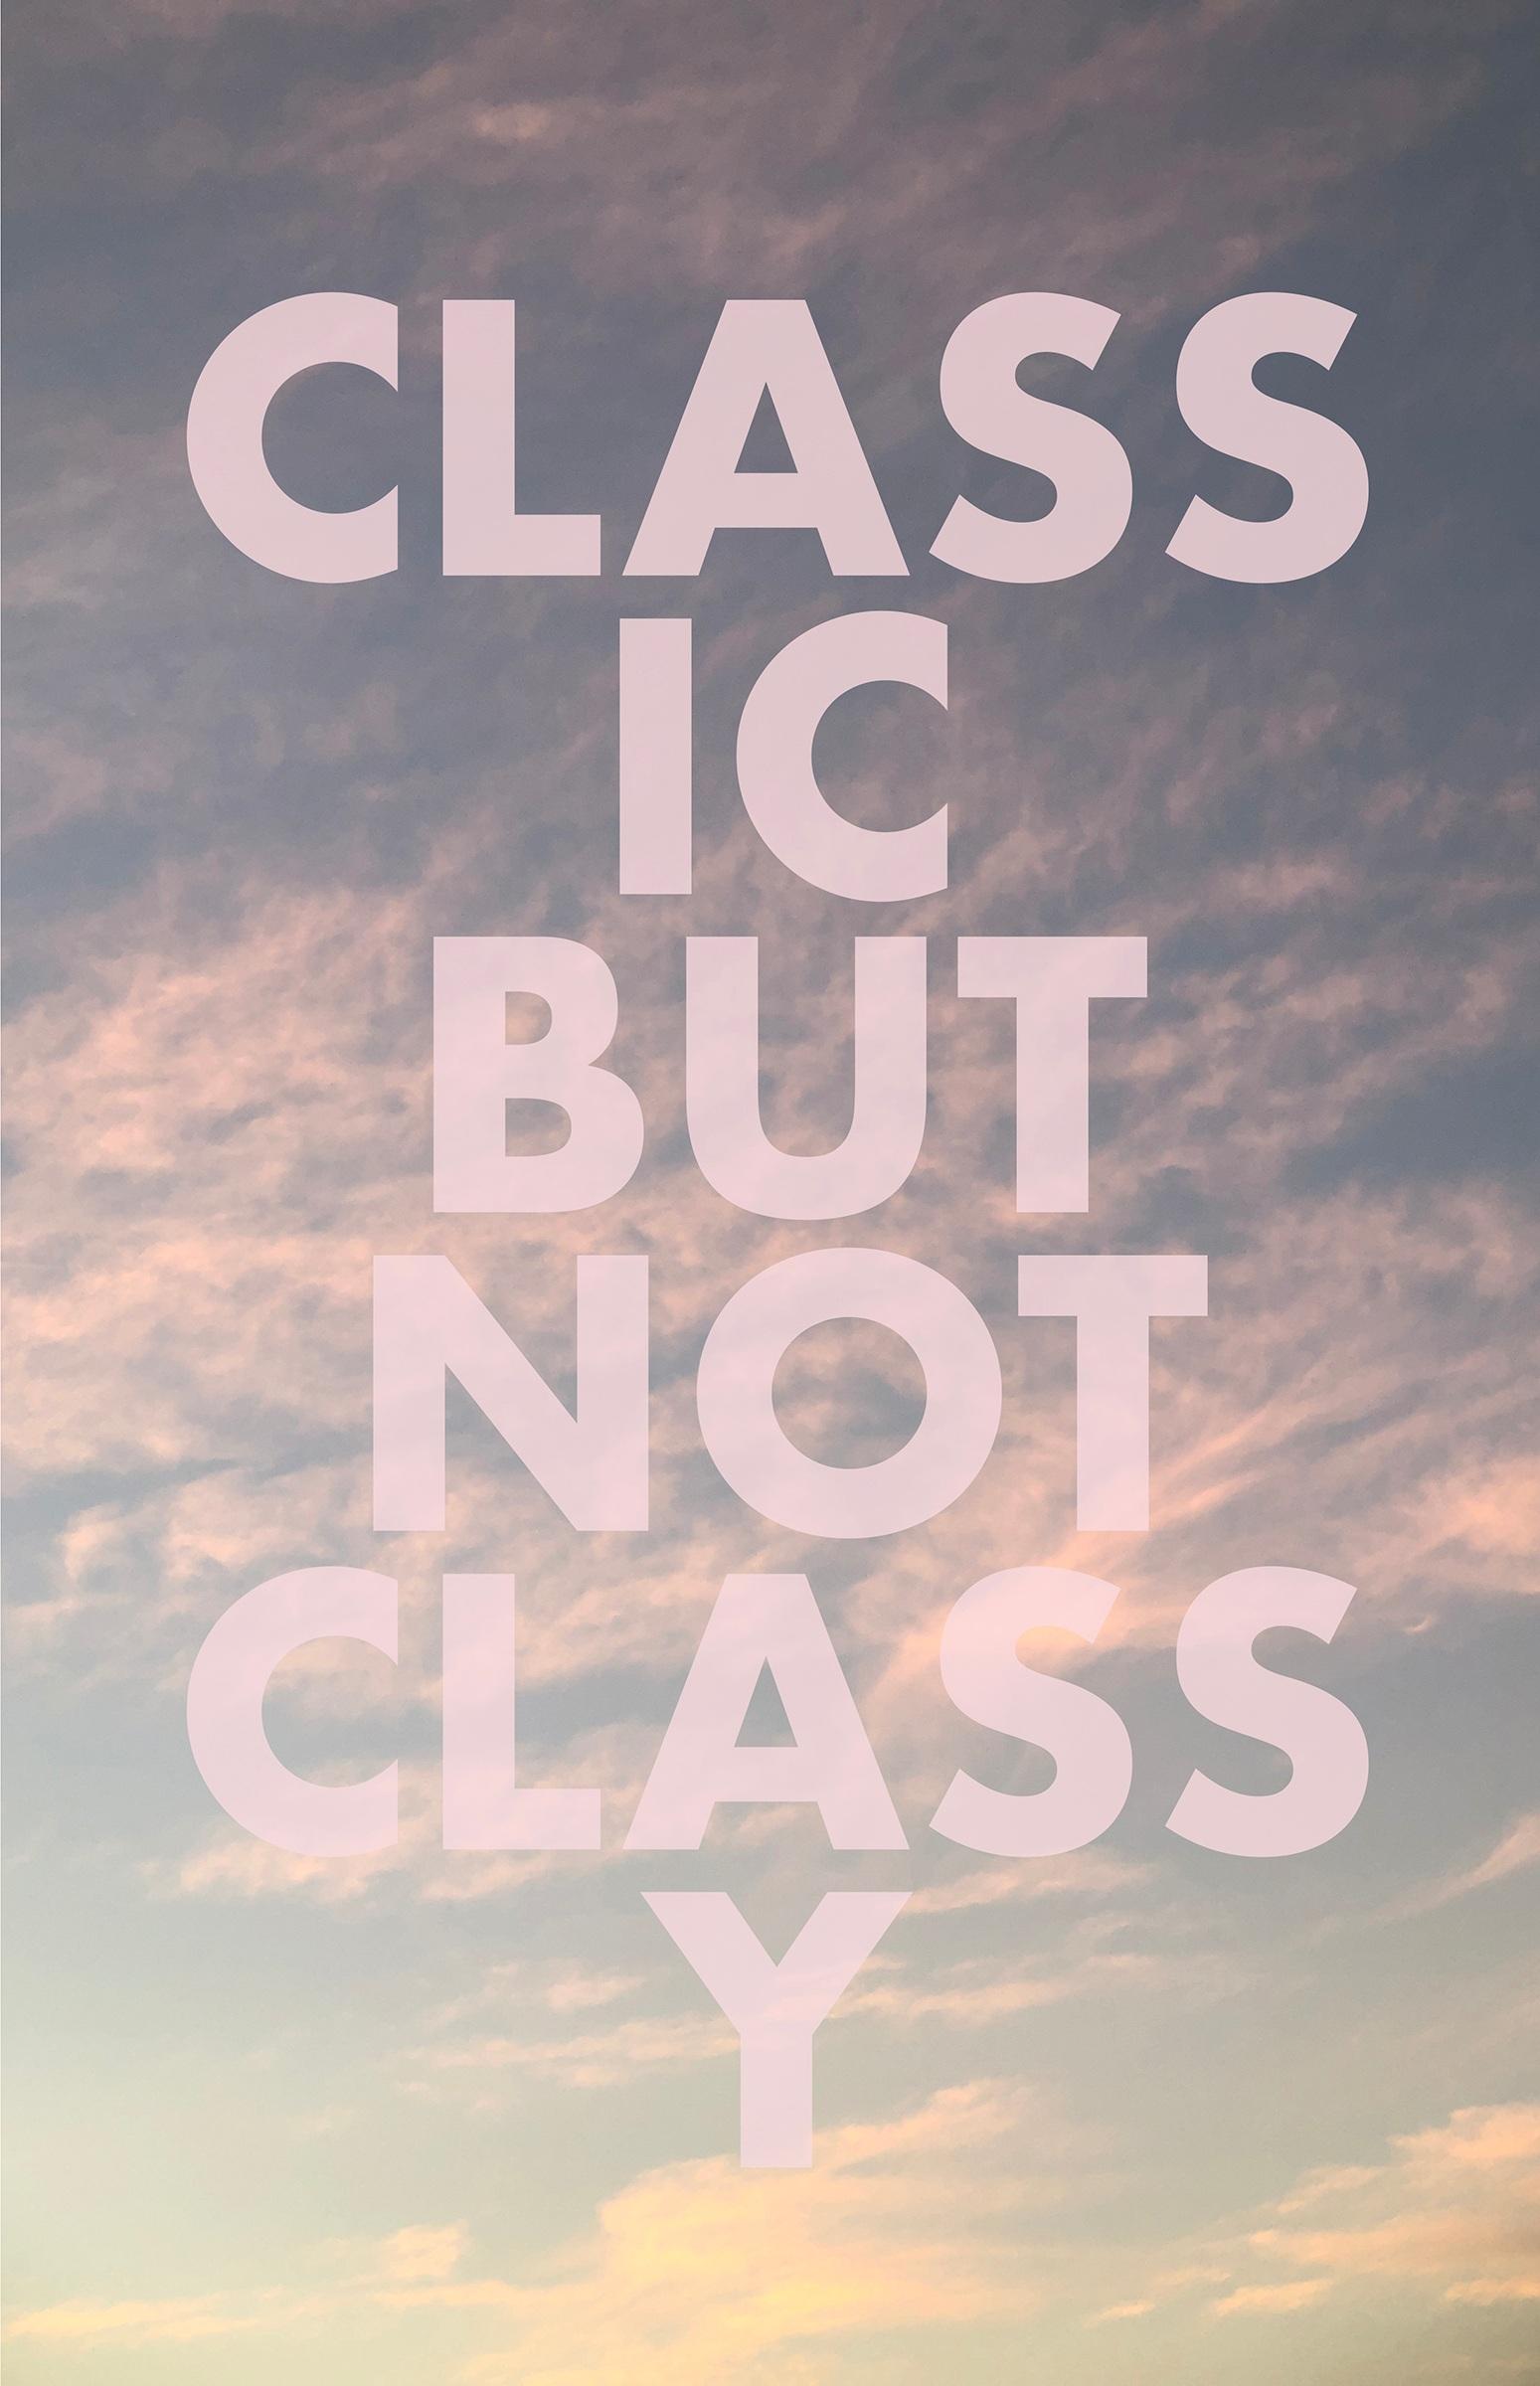 CLASSICBUTNOTCLASSY - socials.jpg